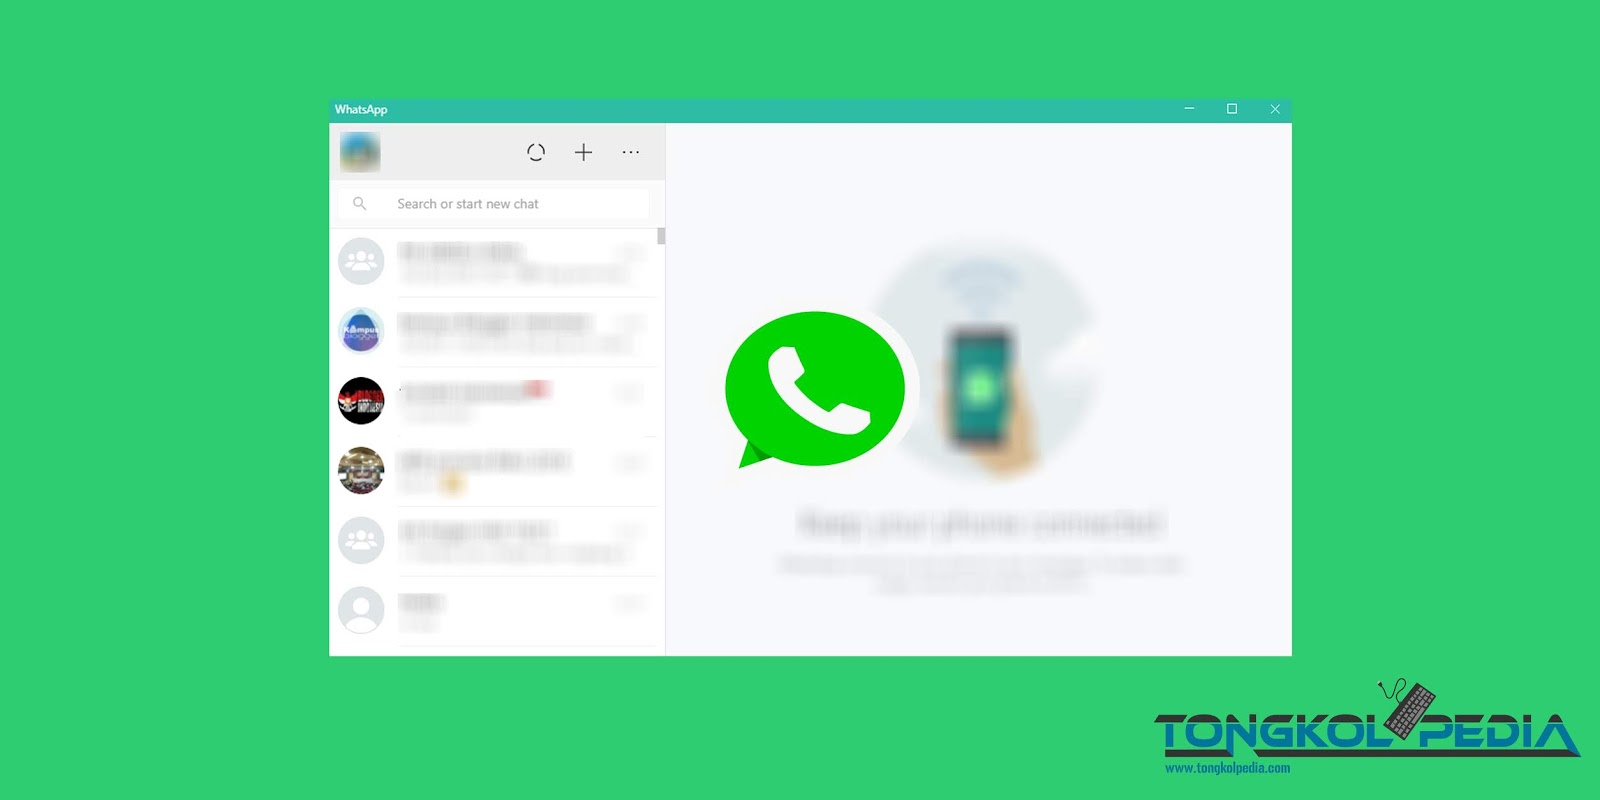 Cara Menggunakan WhatsApp di Laptop atau PC